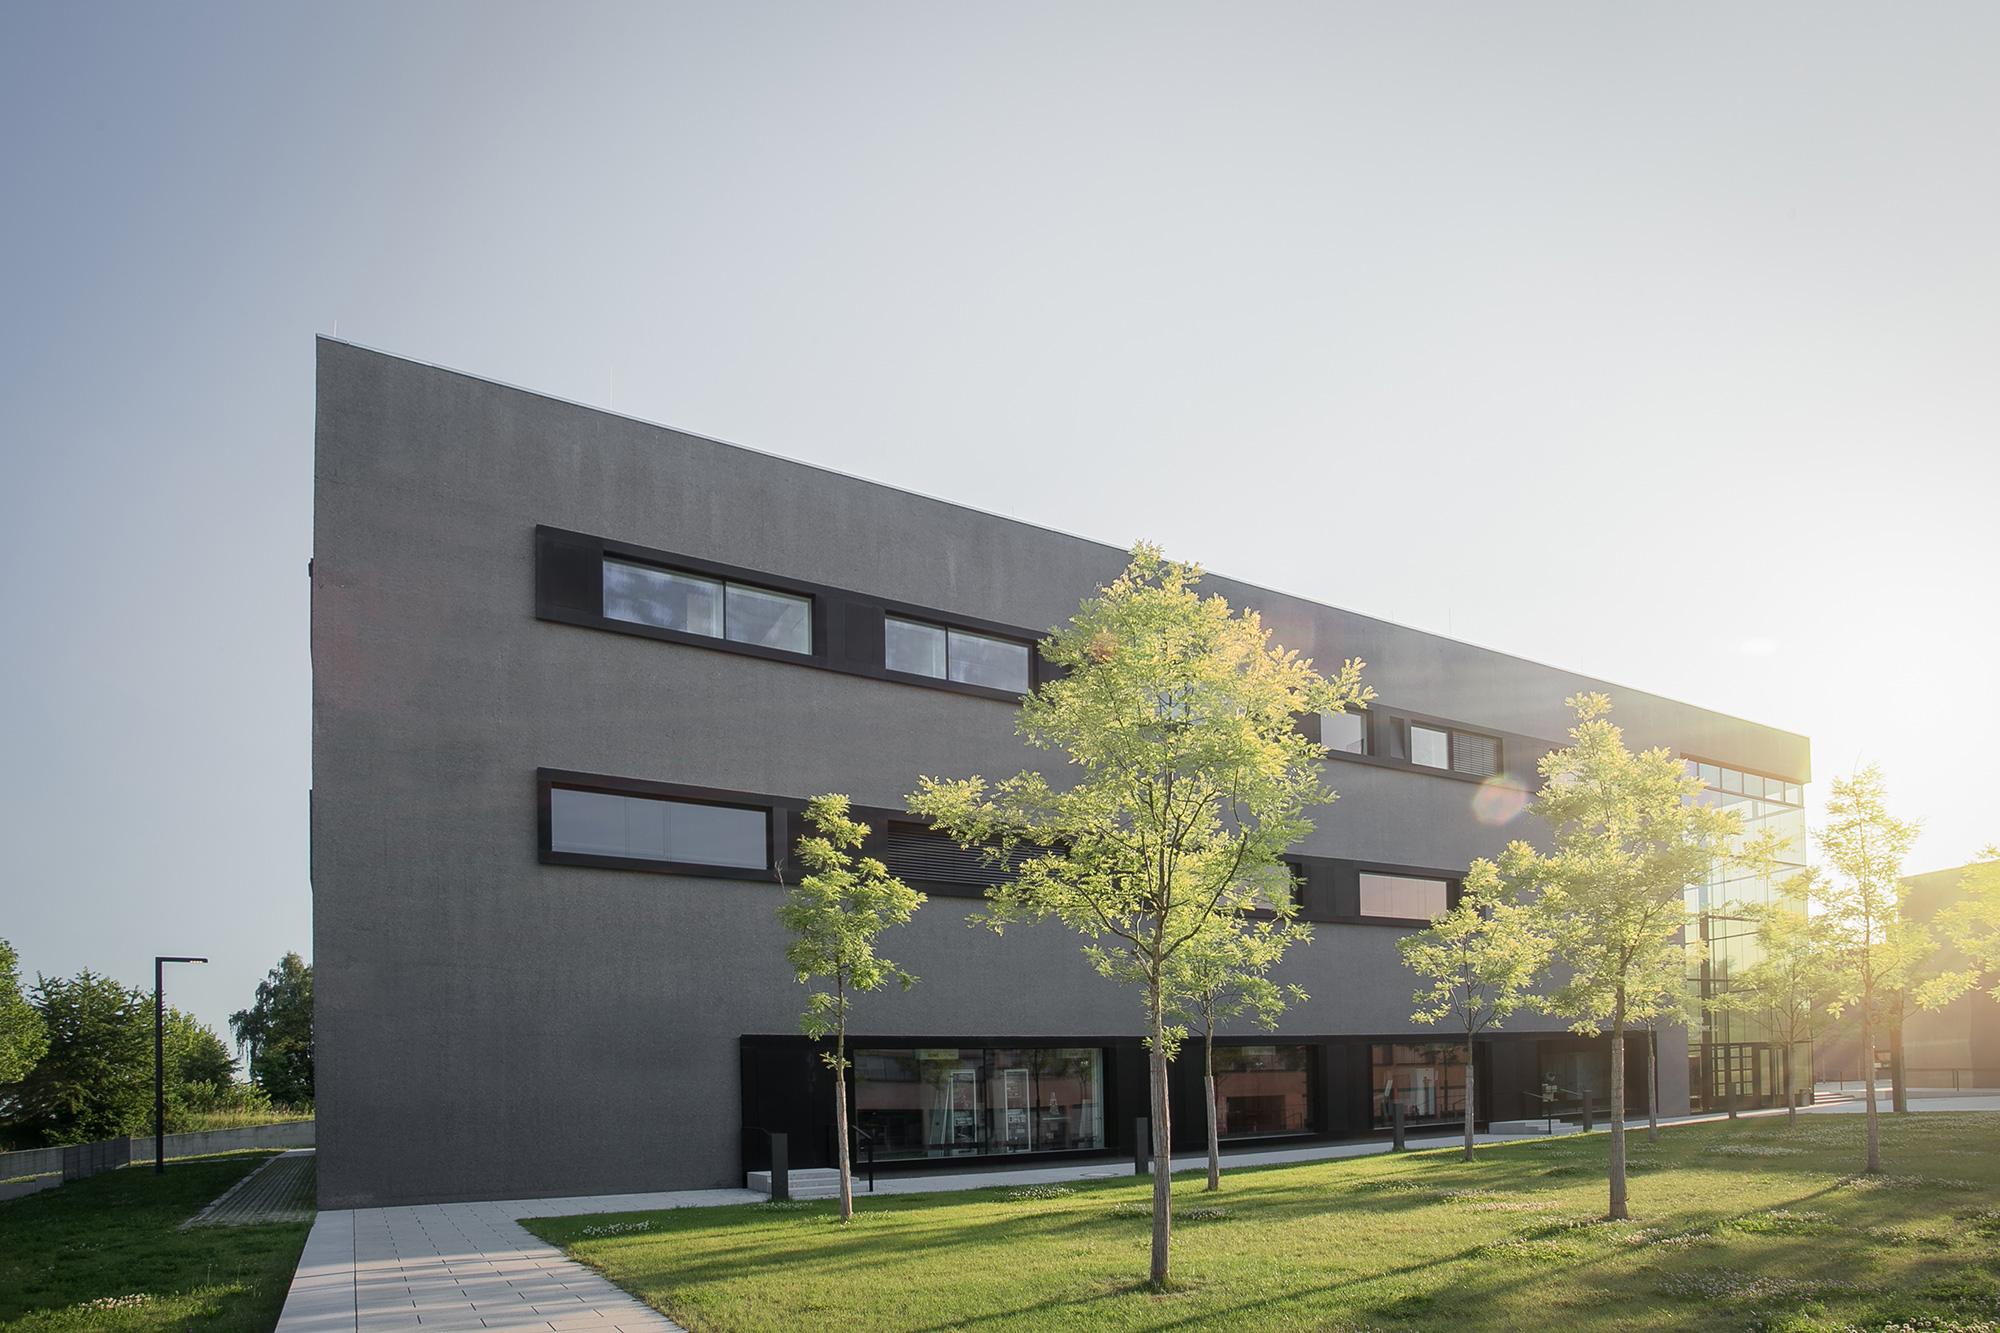 haushofer hochschule deggendorf